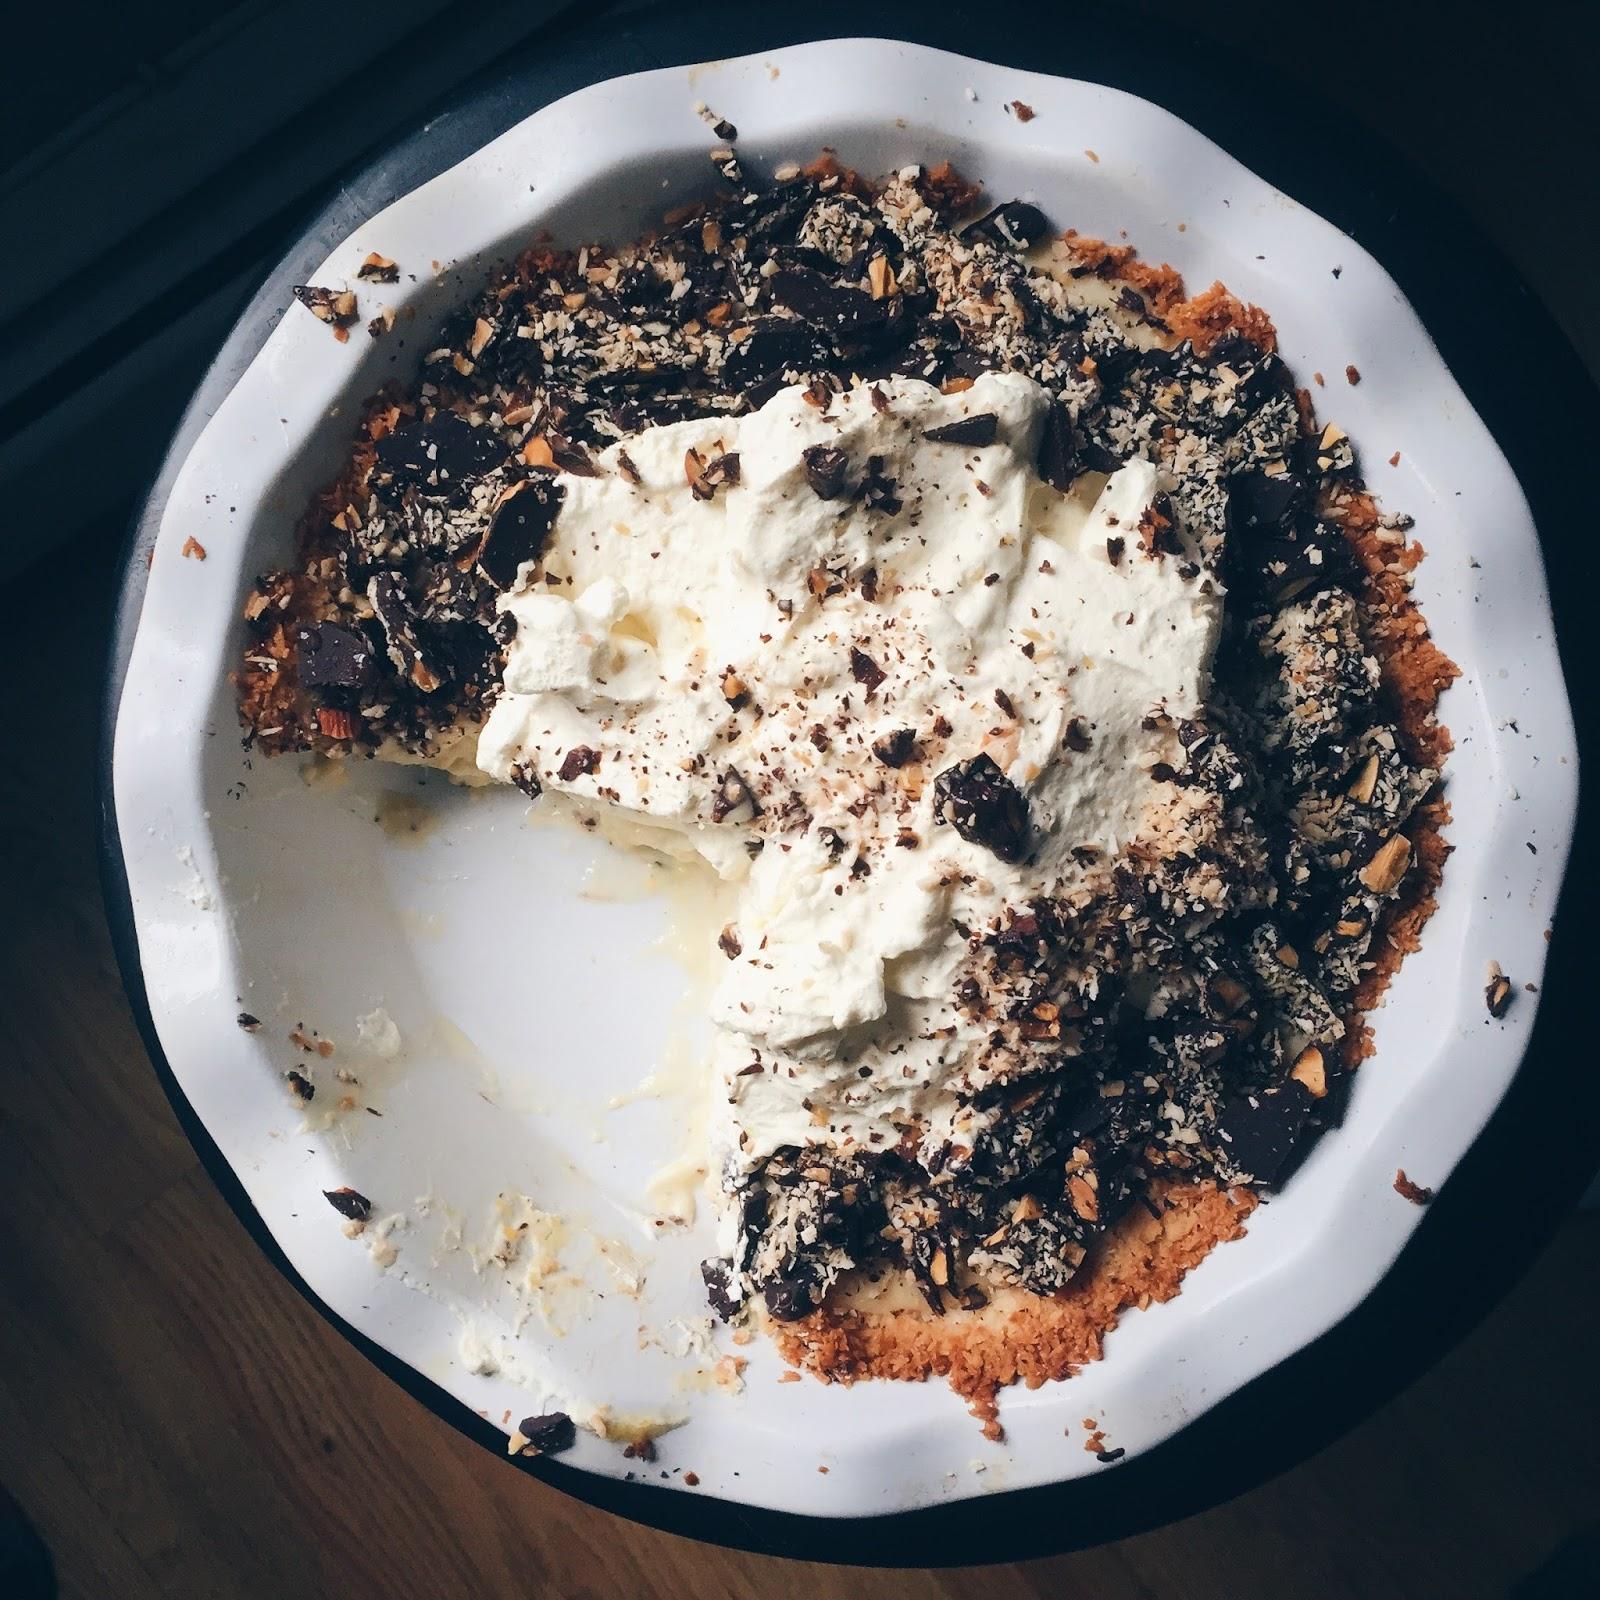 Chocolate Macaroon Pie - Crazy for Crust |Coconut Almond Macaroon Pie Crust